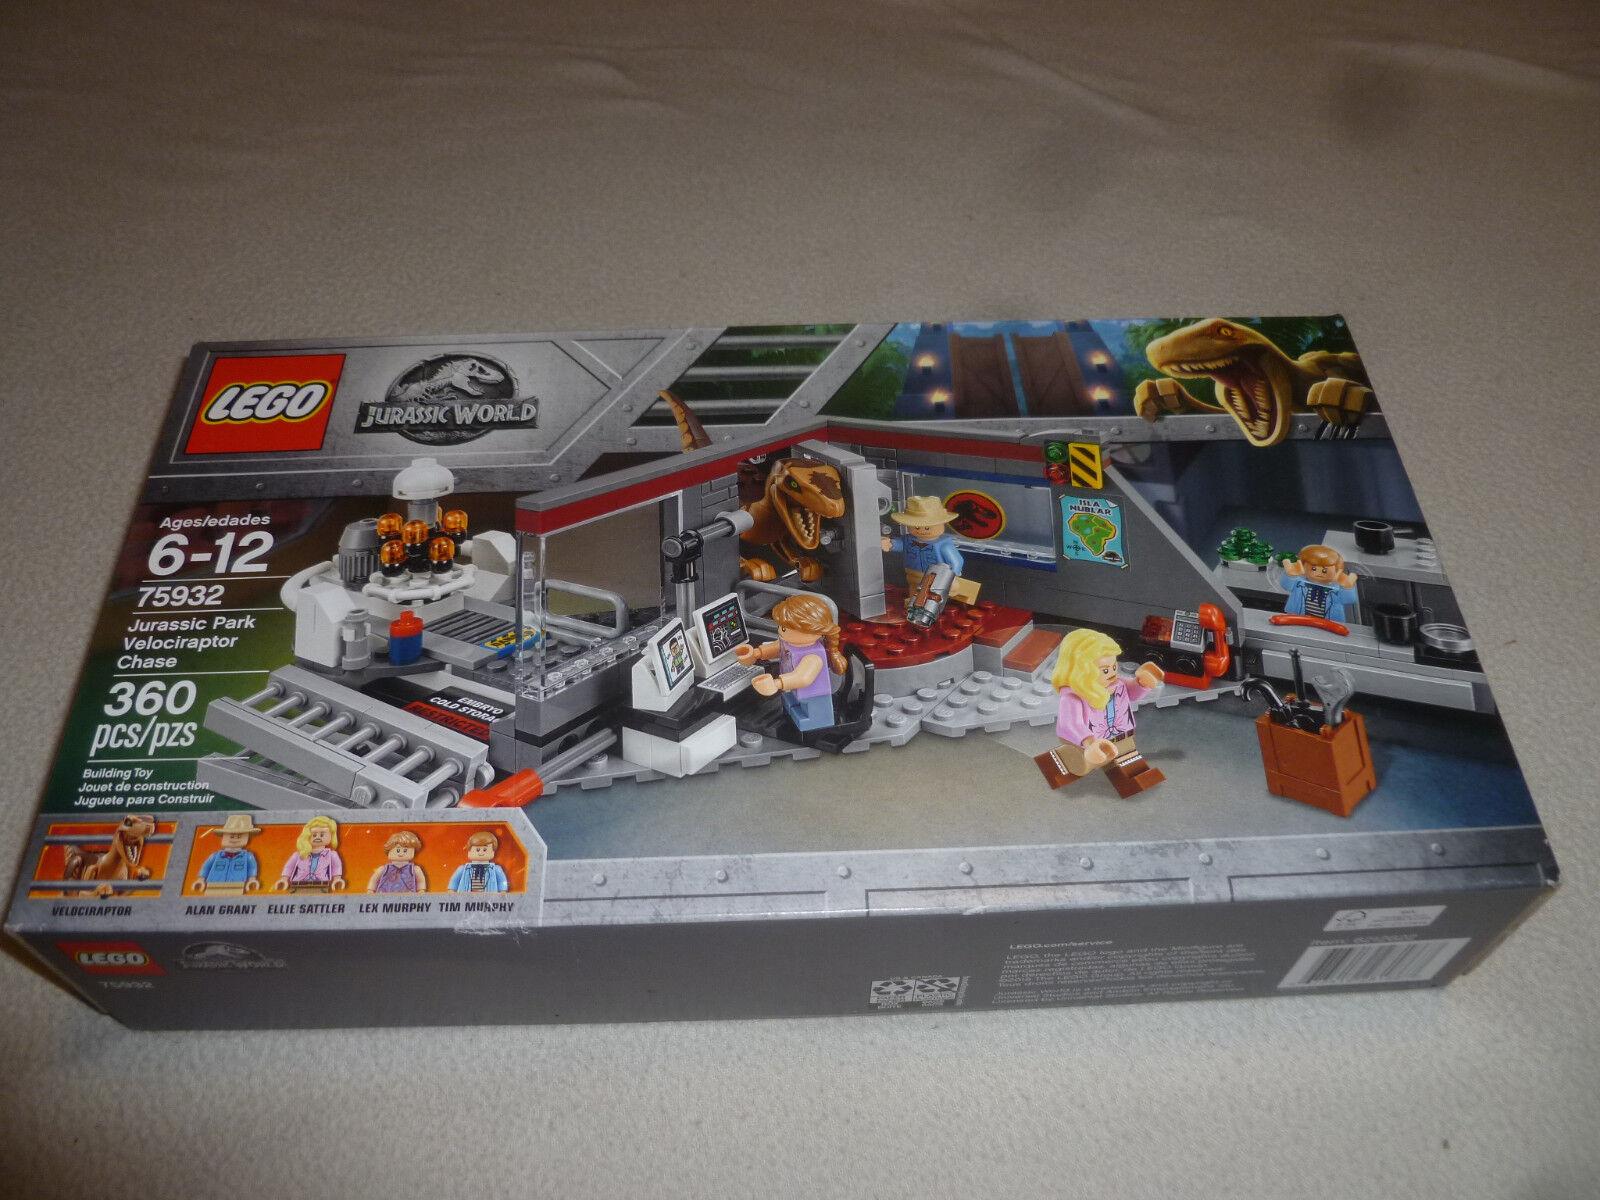 NEW NEW NEW IN BOX LEGO JURASSIC WORLD SET 75932 PARK VELOCIRAPTOR CHASE NIB ALAN GRANT 1ec67d